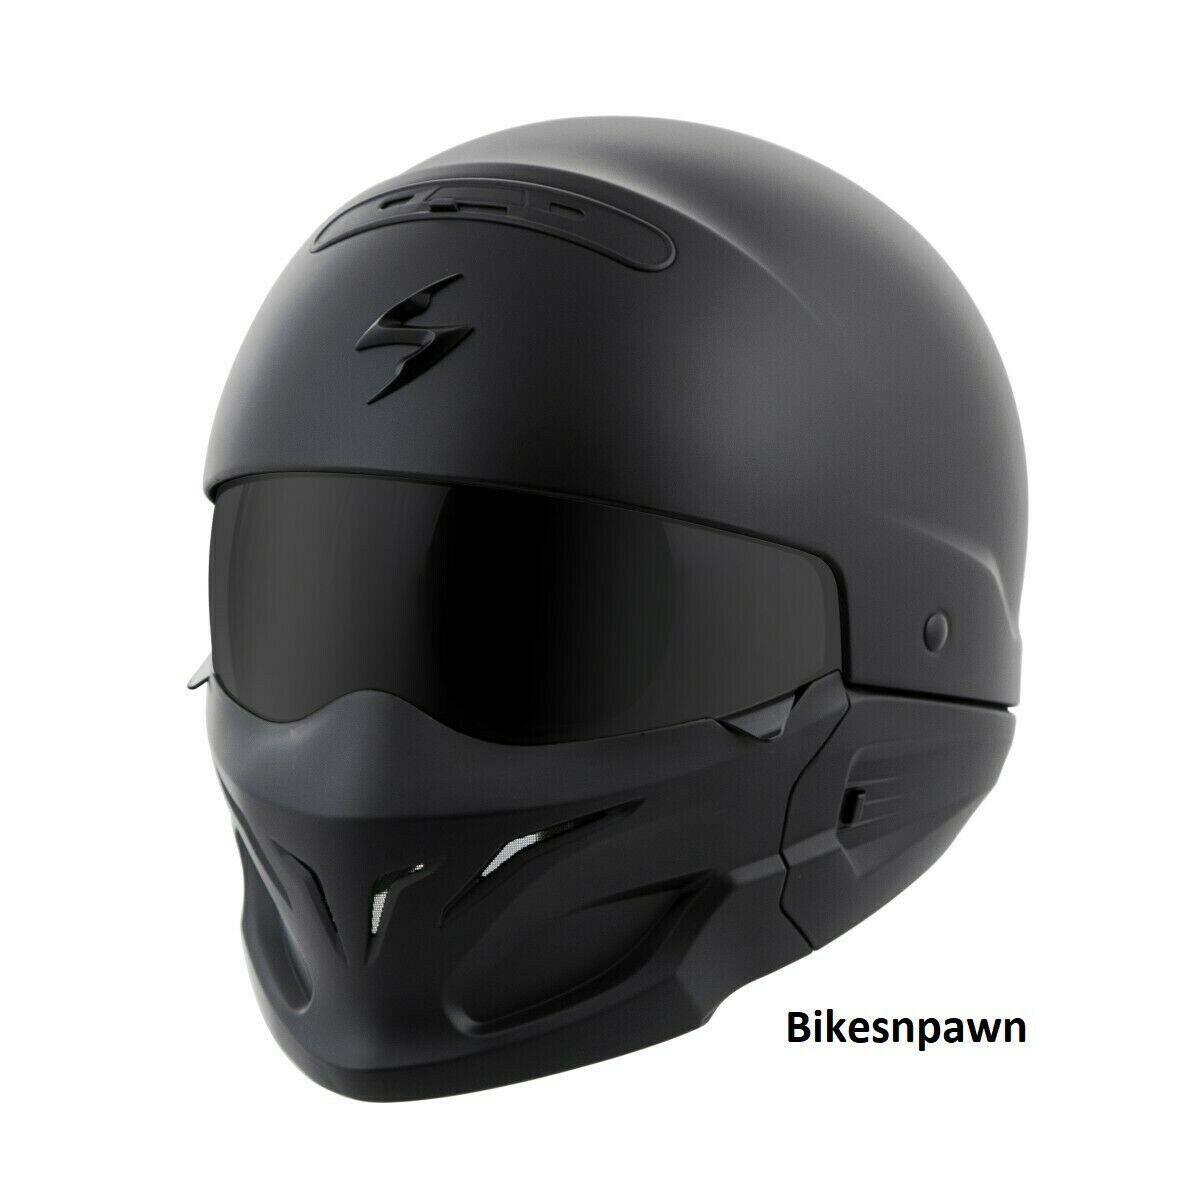 New Size 3XL Scorpion EXO Covert Matt Black 3 in 1 Motorcycle Helmet DOT